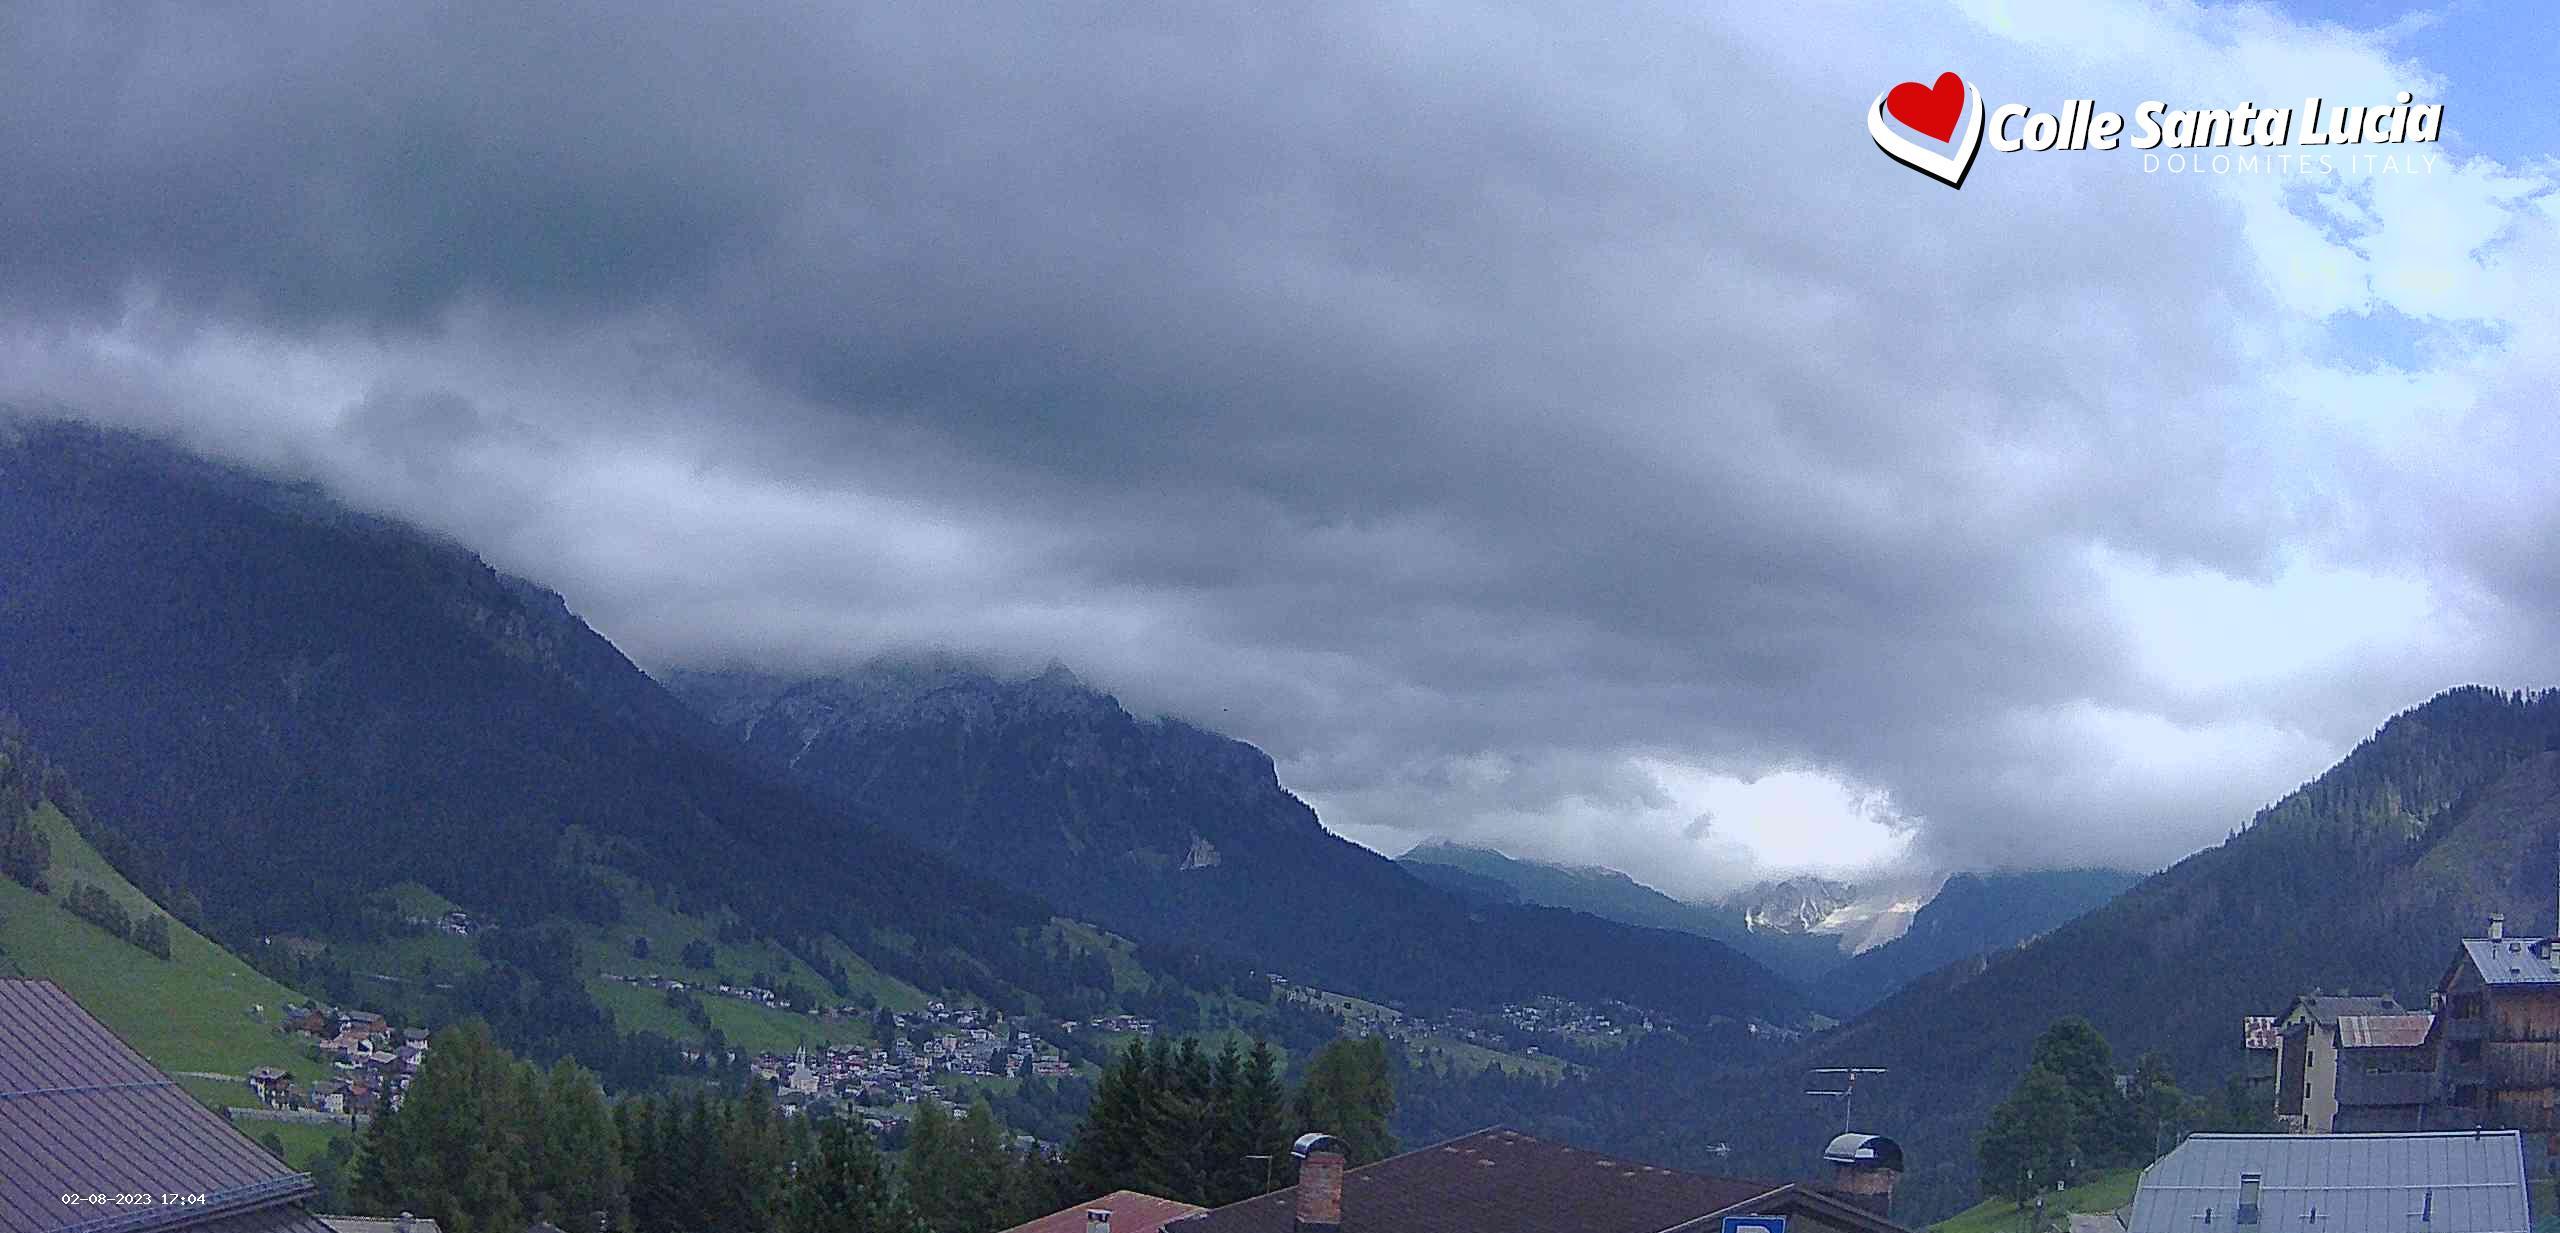 Webcam Val Fiorentina da Colle Santa Lucia, Ski Civetta, Dolomiti Superski